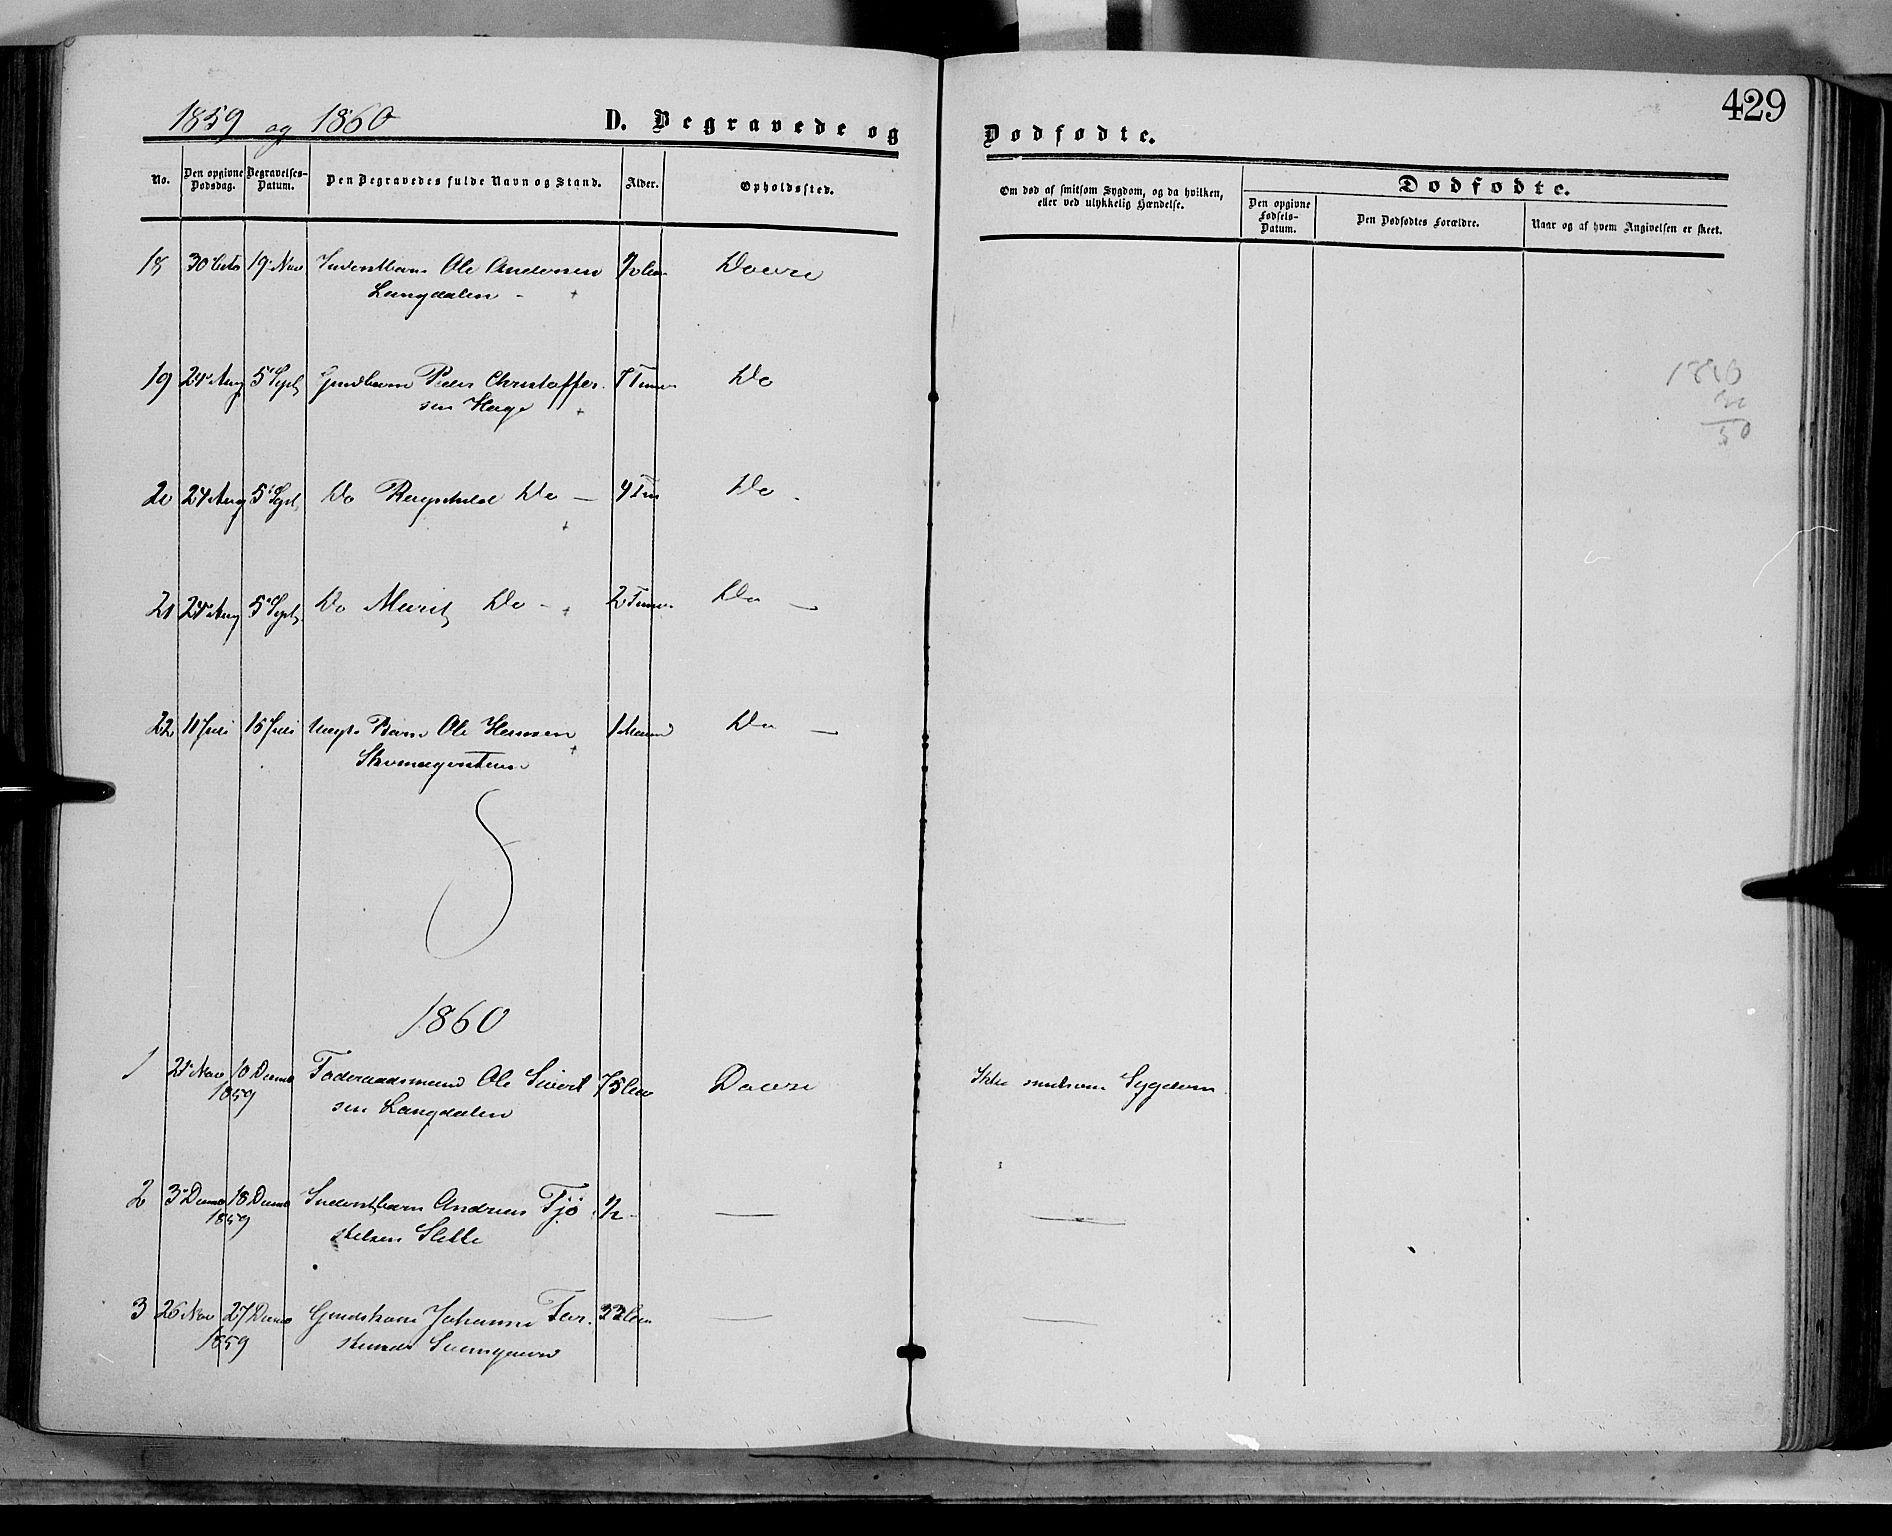 SAH, Dovre prestekontor, Parish register (official) no. 1, 1854-1878, p. 429